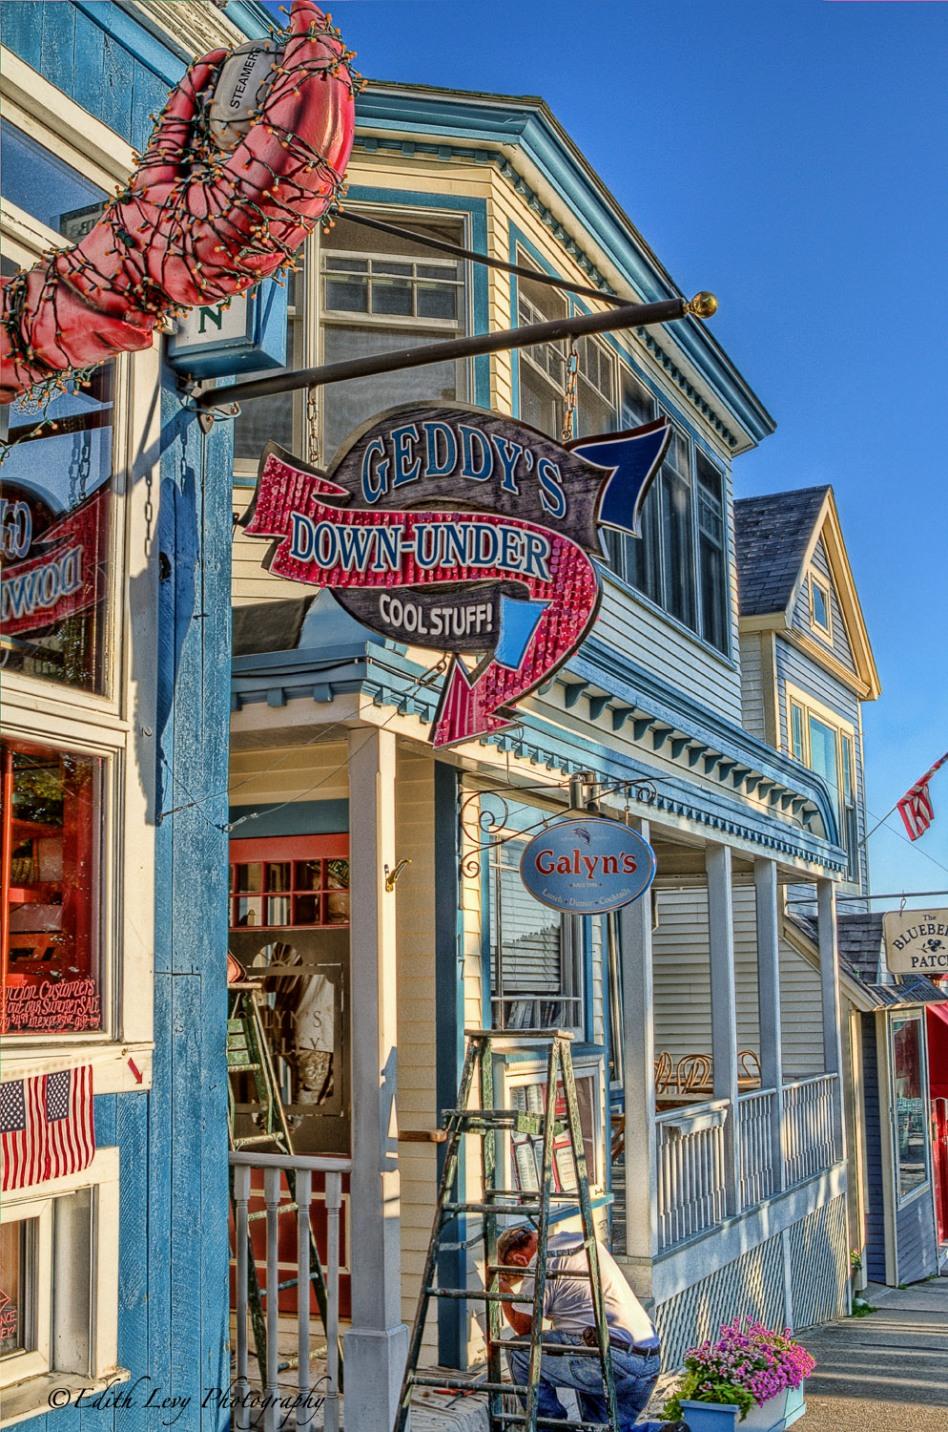 Geddy's, Downunder, Bar Harbor, Main Street, restaurent, bar,